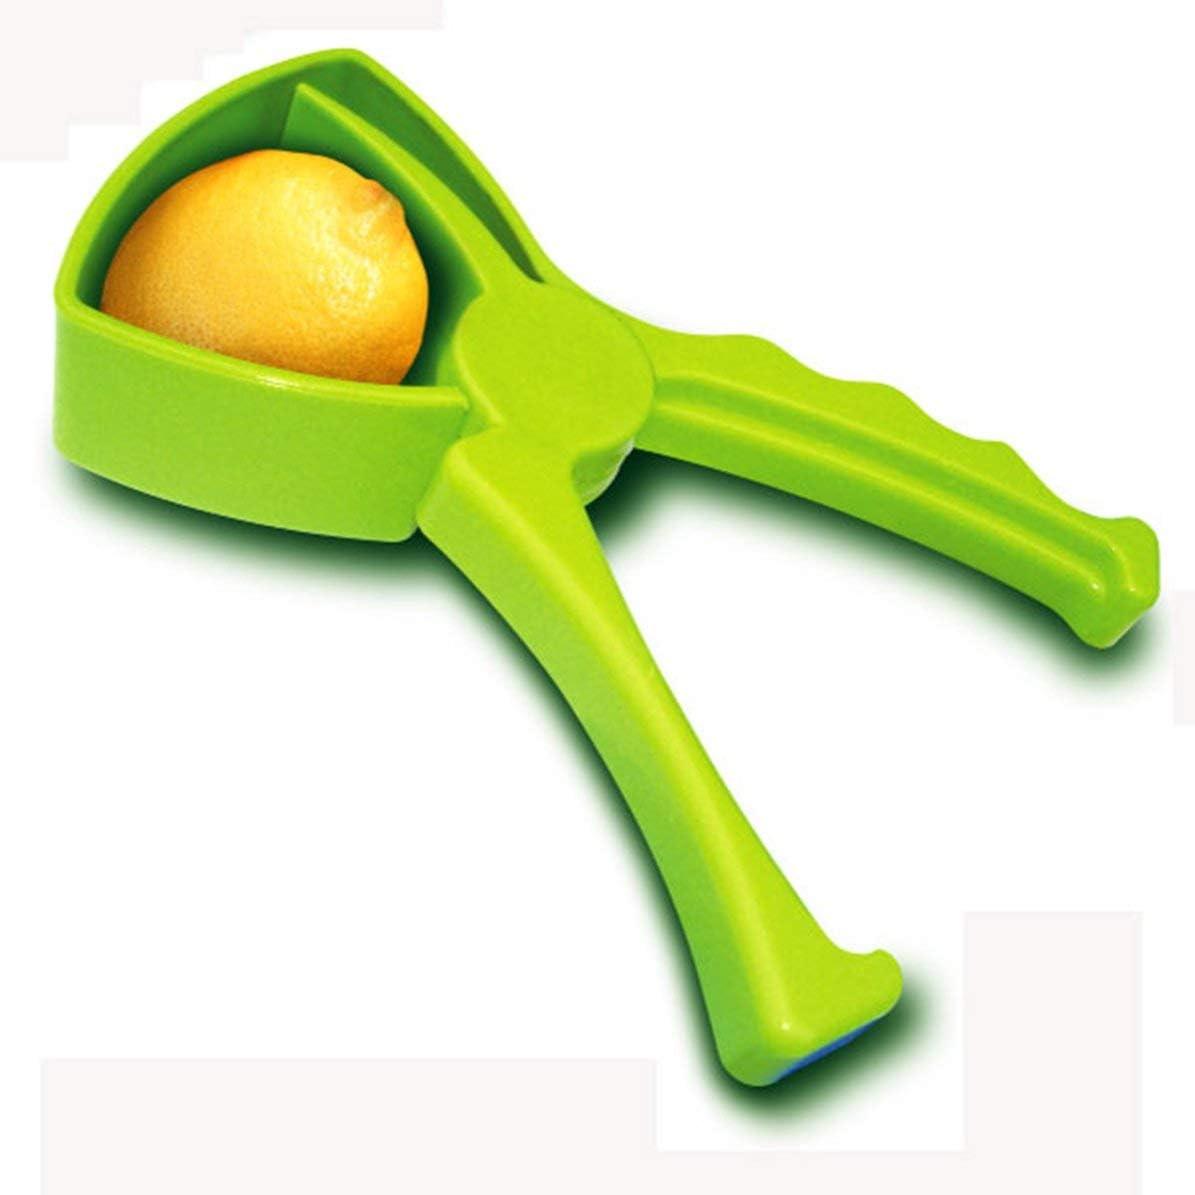 MarinoBIRD HQS-B2454 Extractor de Jugo de limón por Goteo/Extractor de Jugo de Naranja - Multicolor